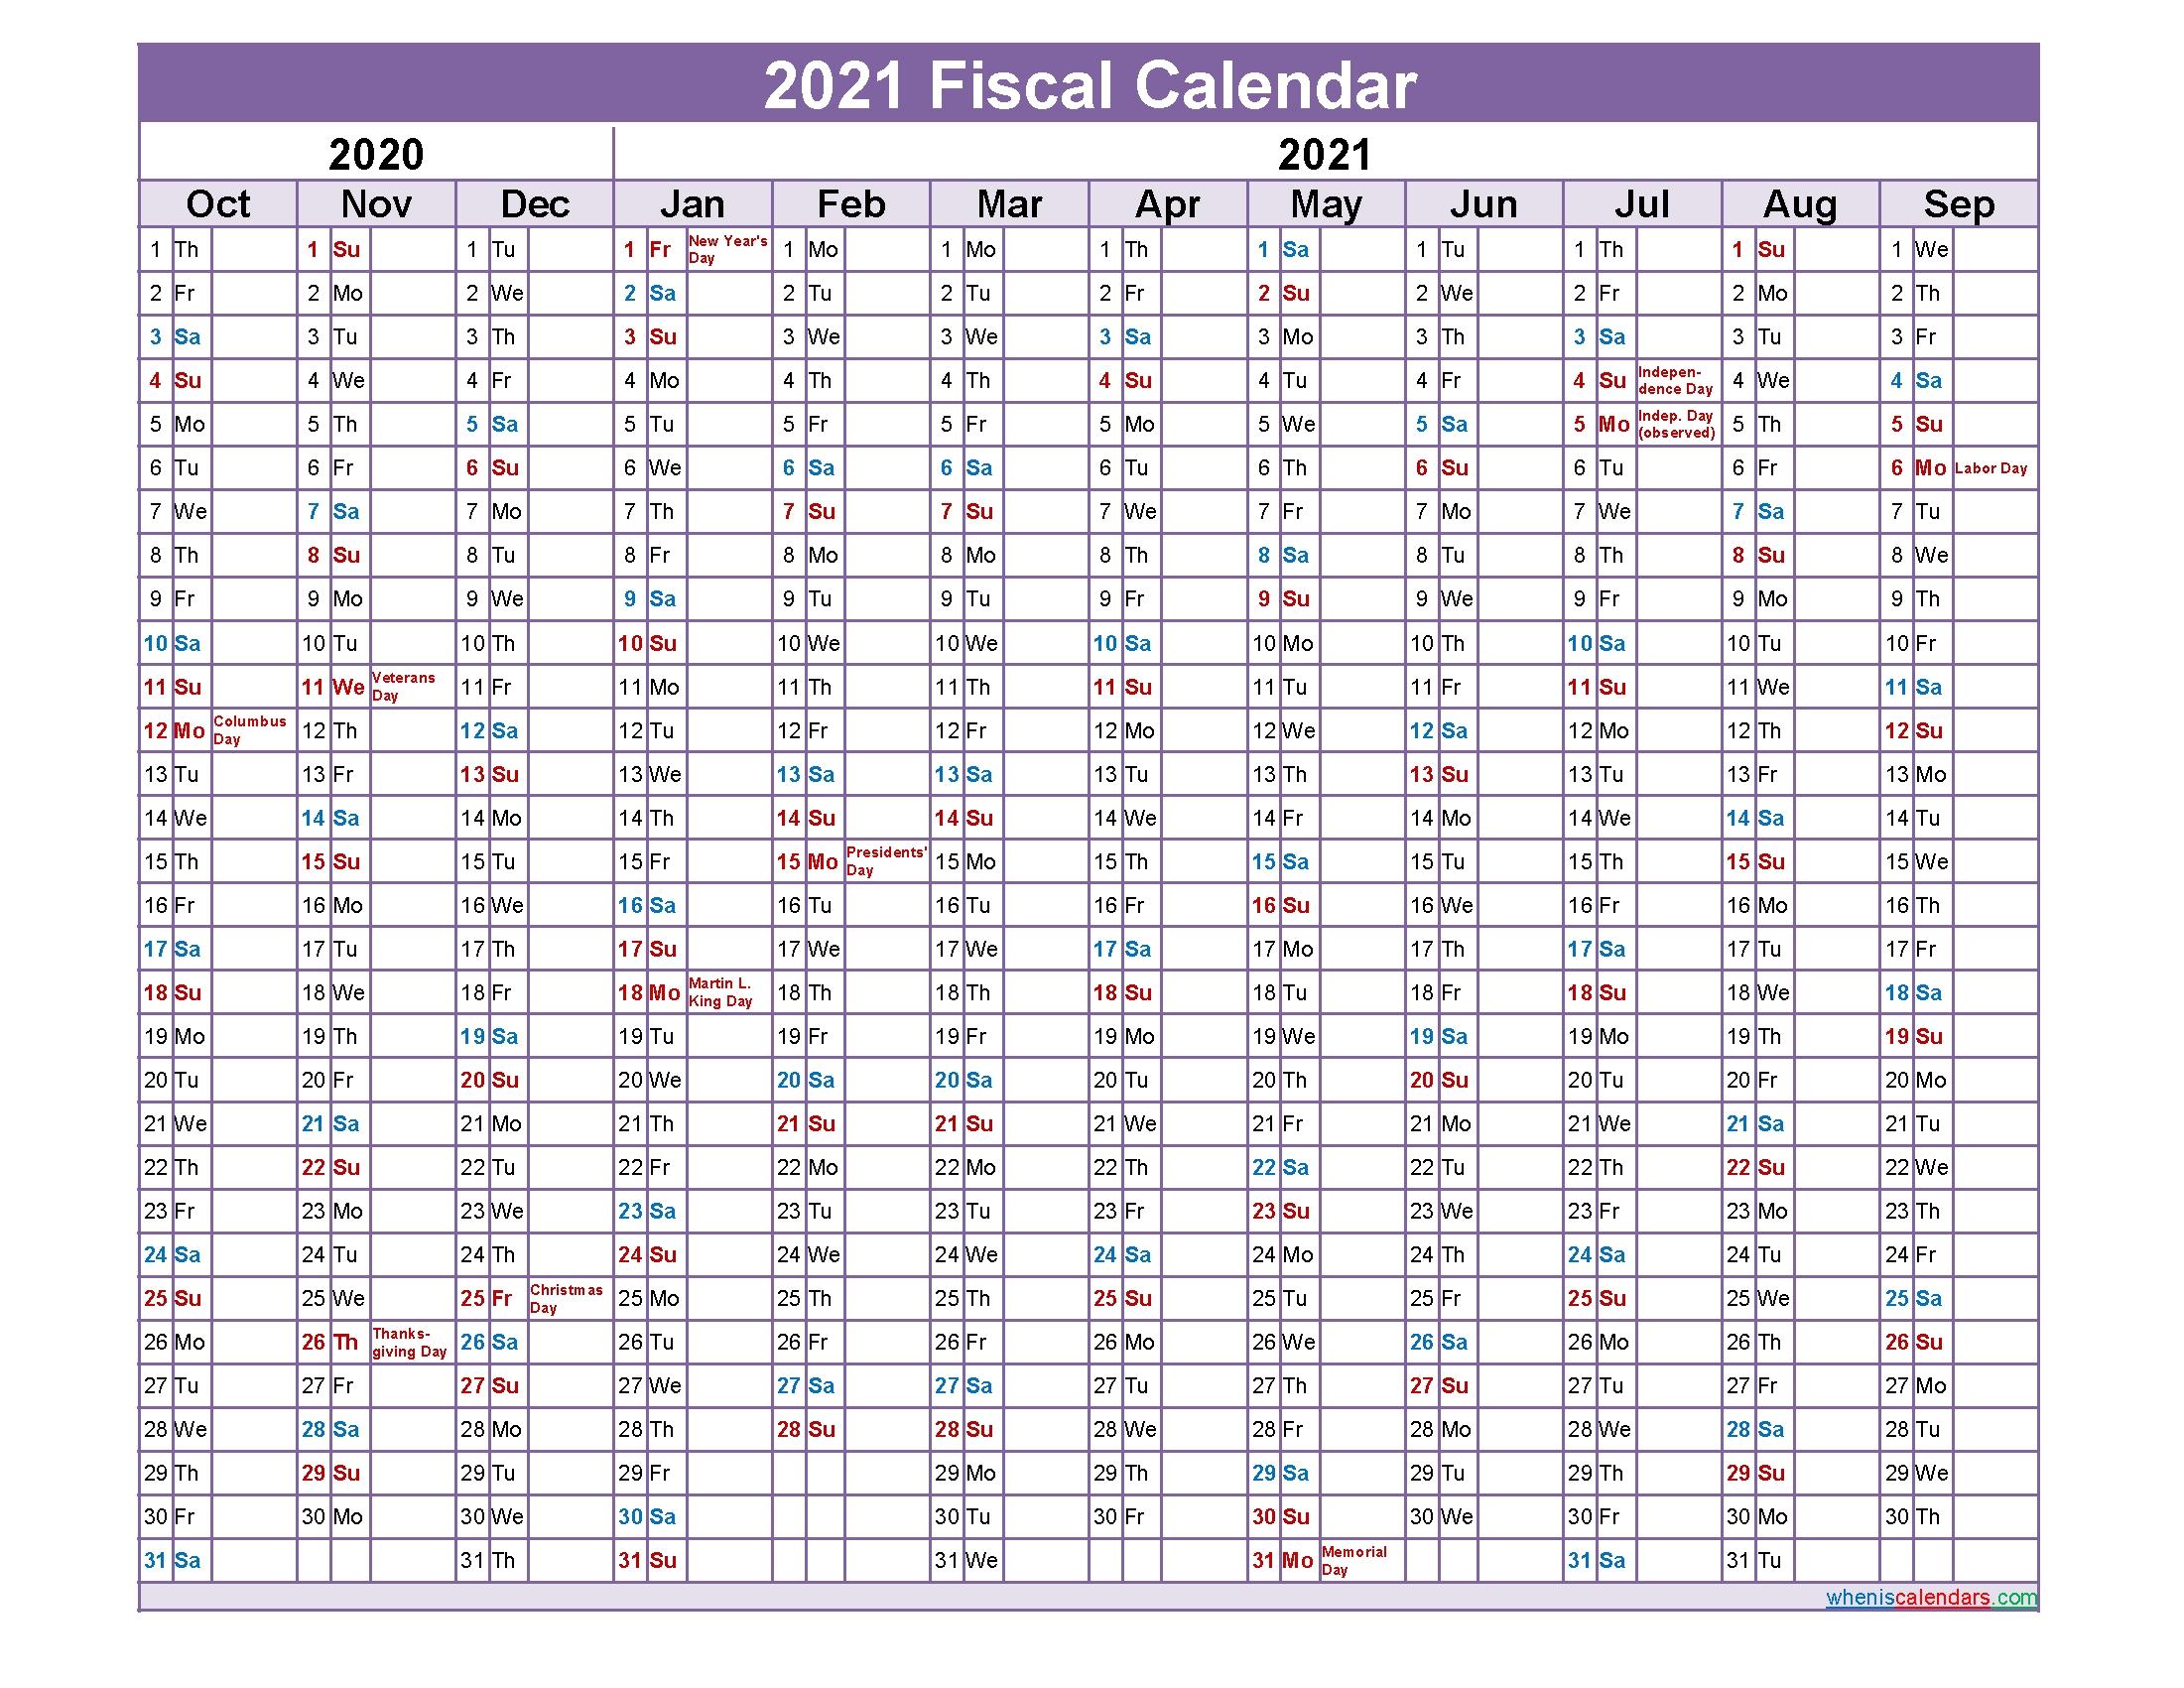 Take Fiscal Calendar 2021 2021